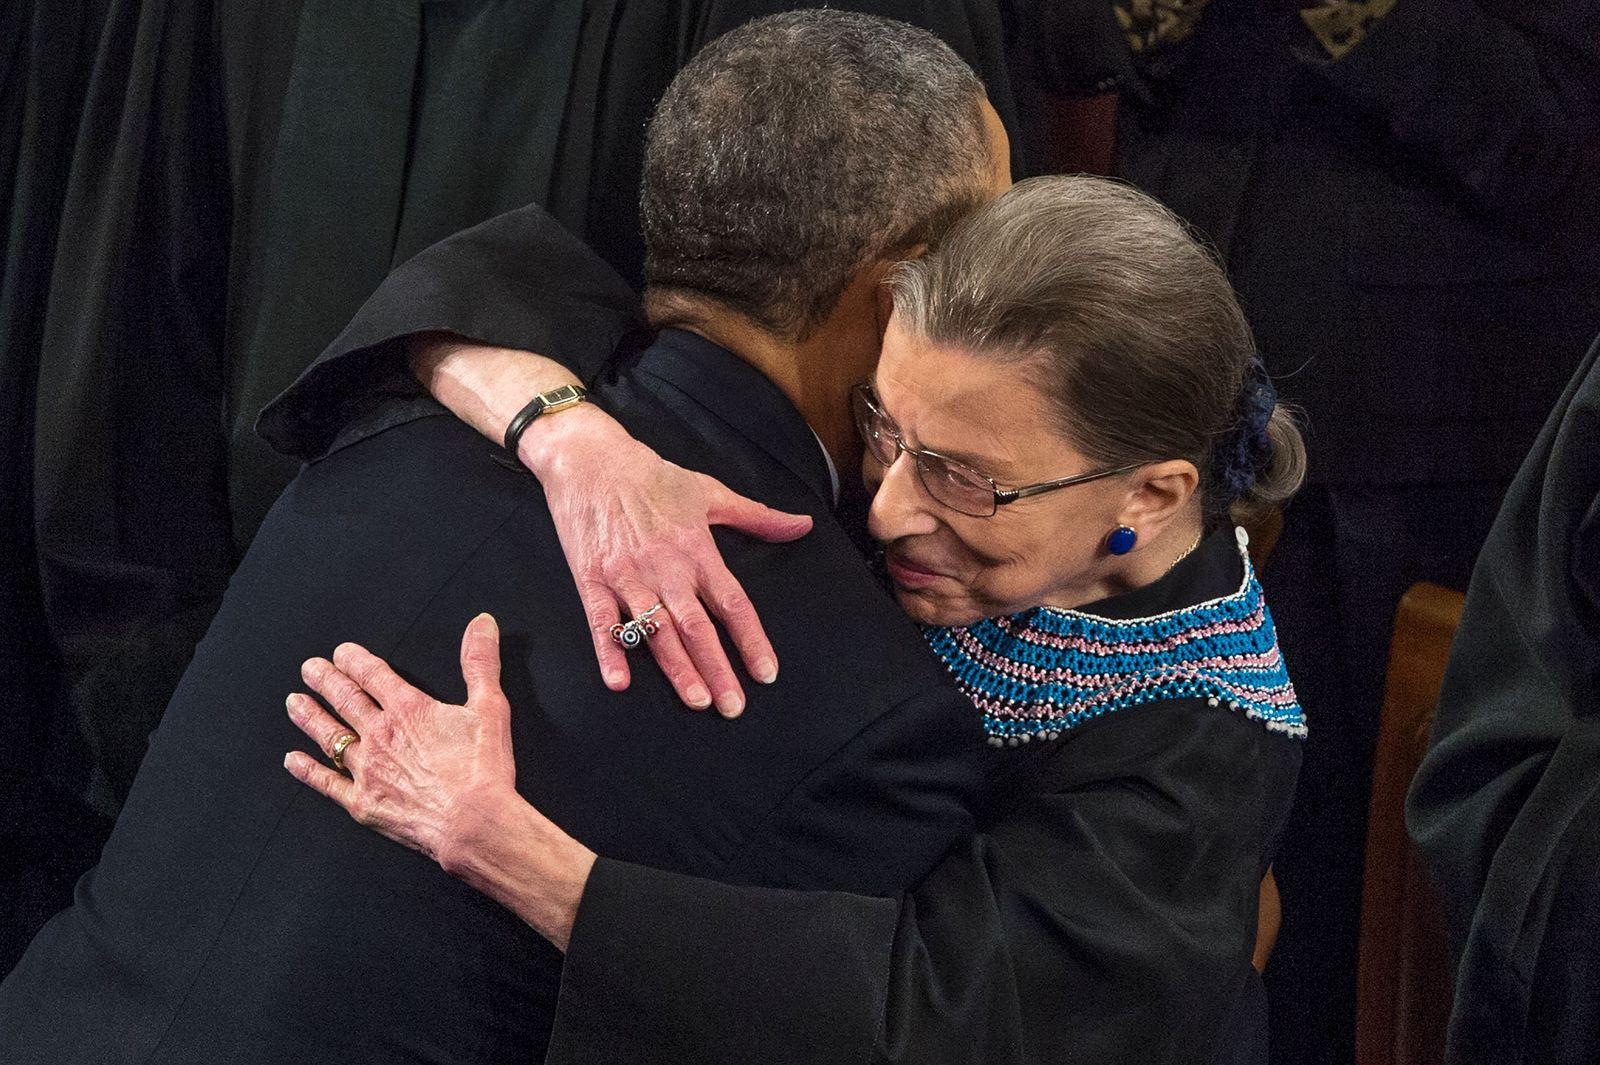 United States Supreme Court Justice Ruth Bader Ginsburg dies at the age of 87, Washington, Usa - 28 Jan 2014